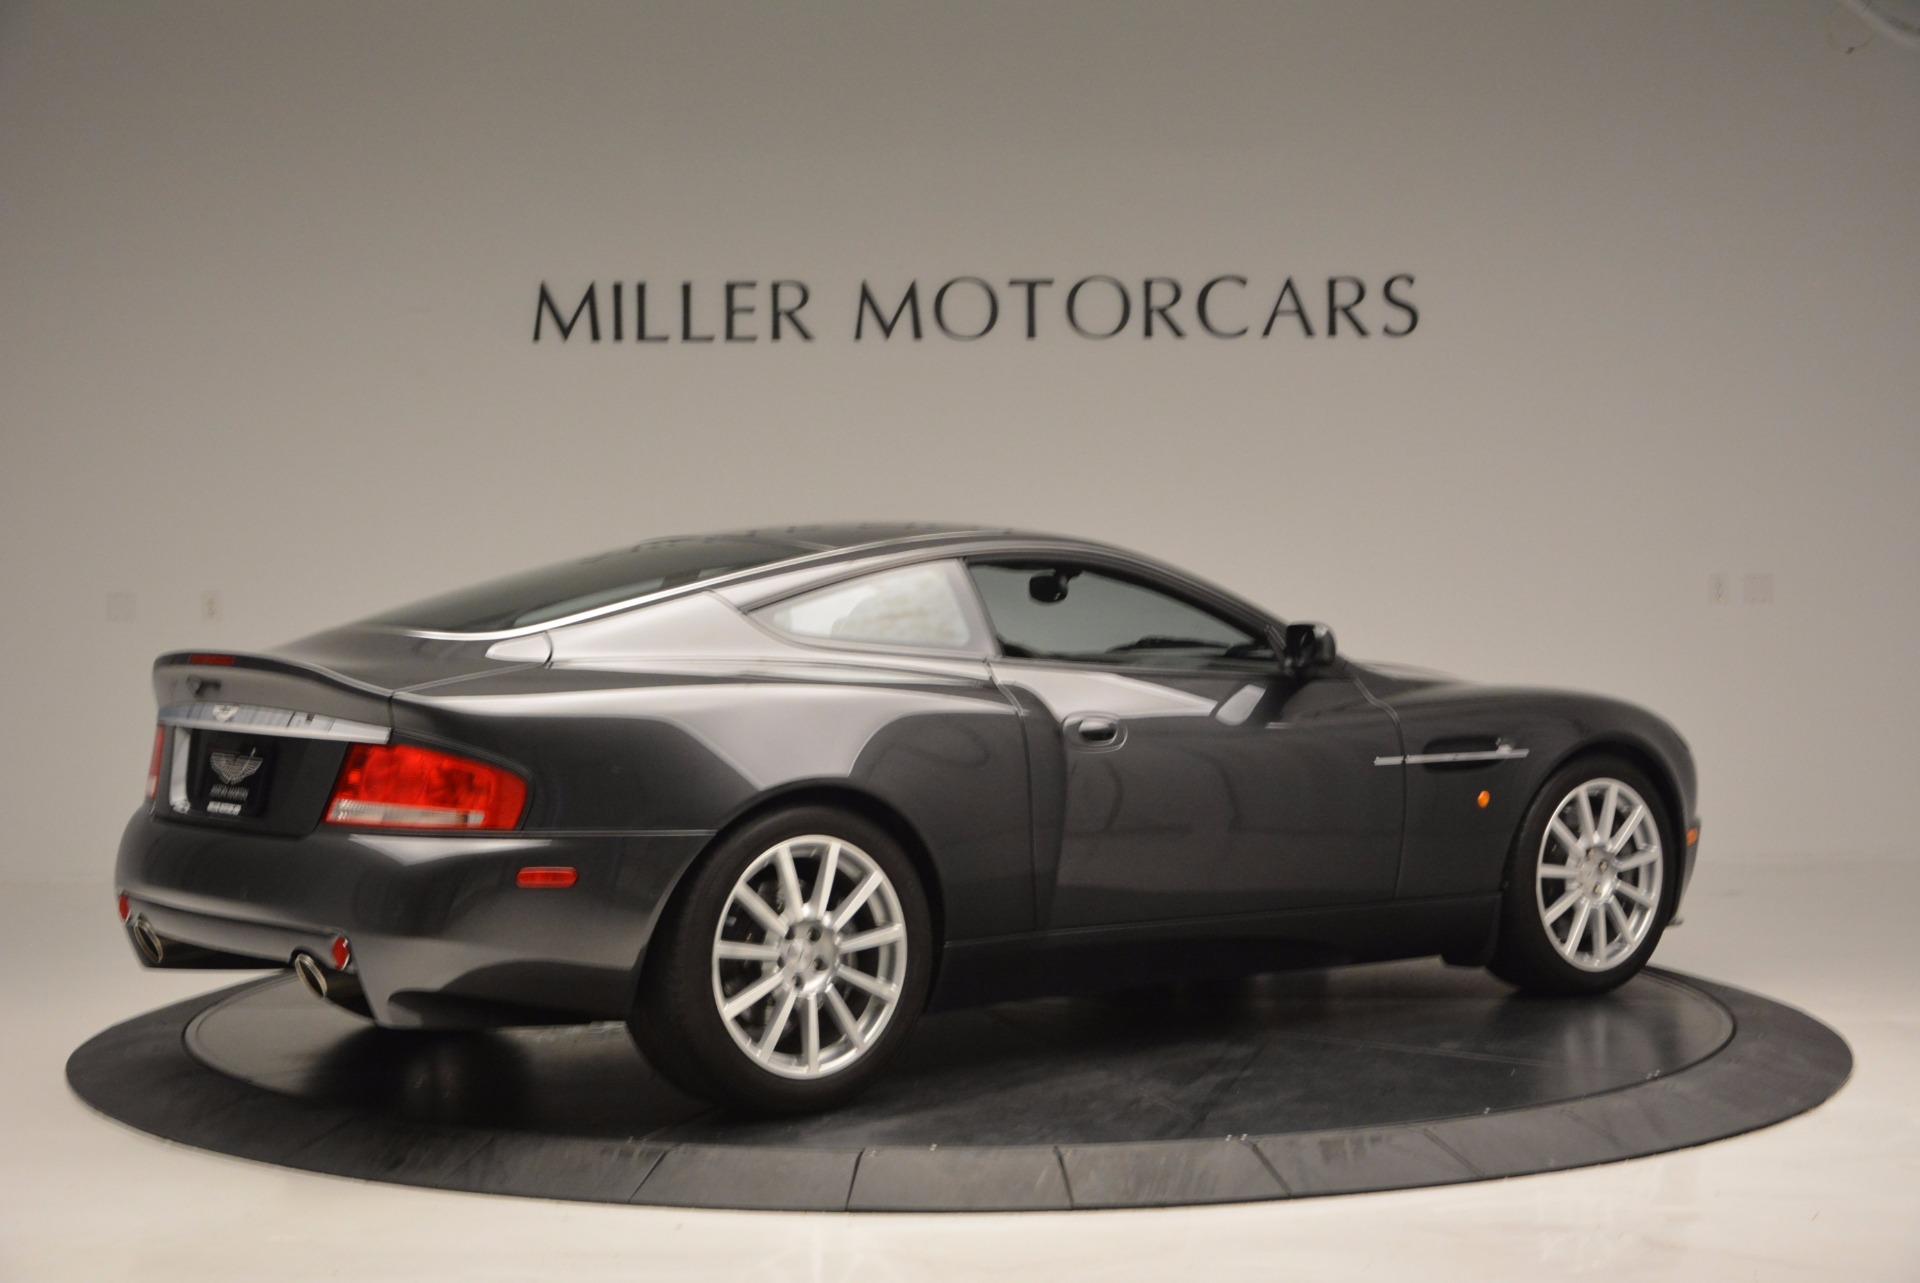 Used 2005 Aston Martin V12 Vanquish S